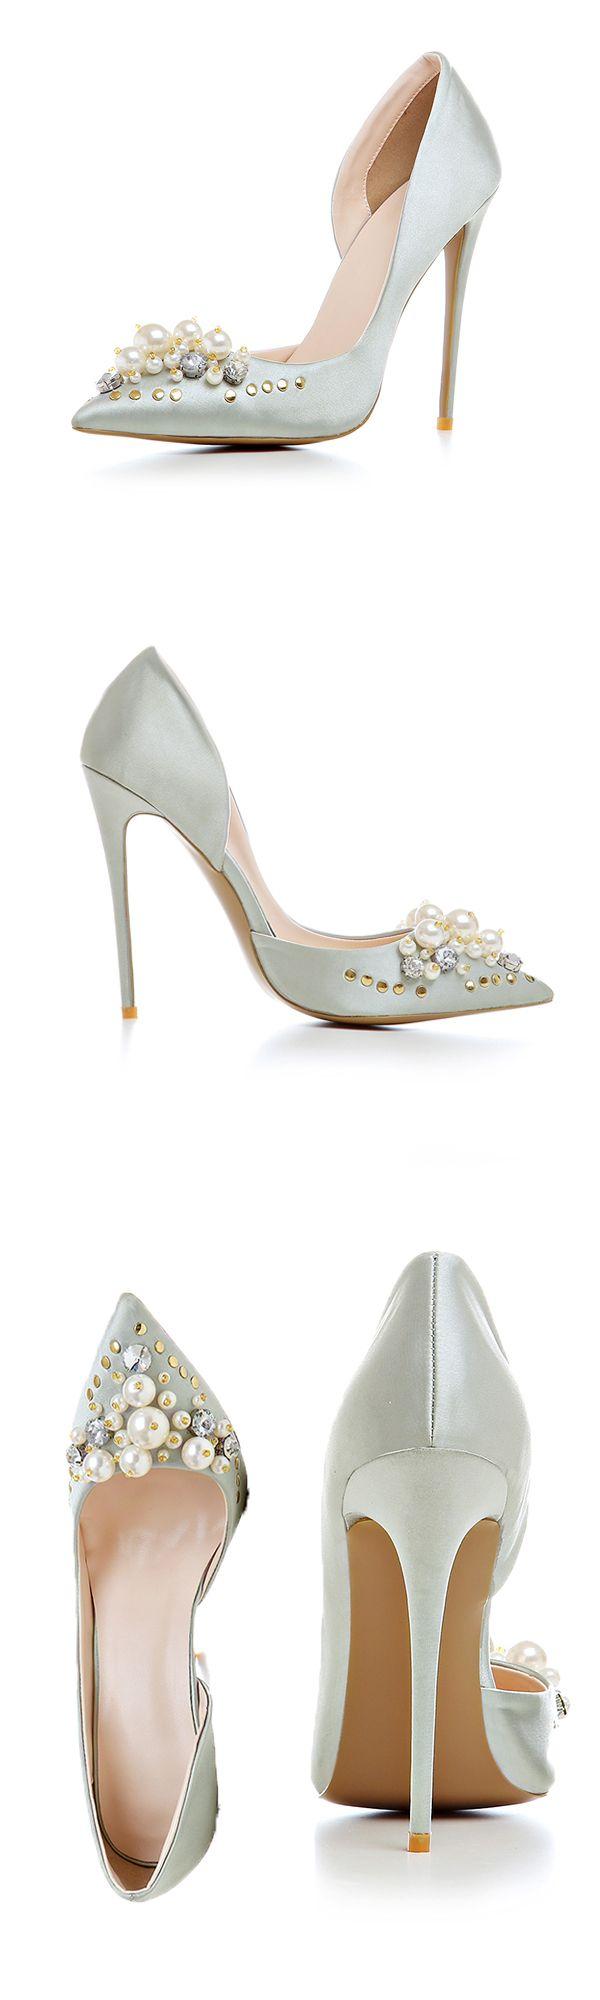 Material:Silk Fabric>You will need this Rhinestone Beads Rivet Stiletto Heels